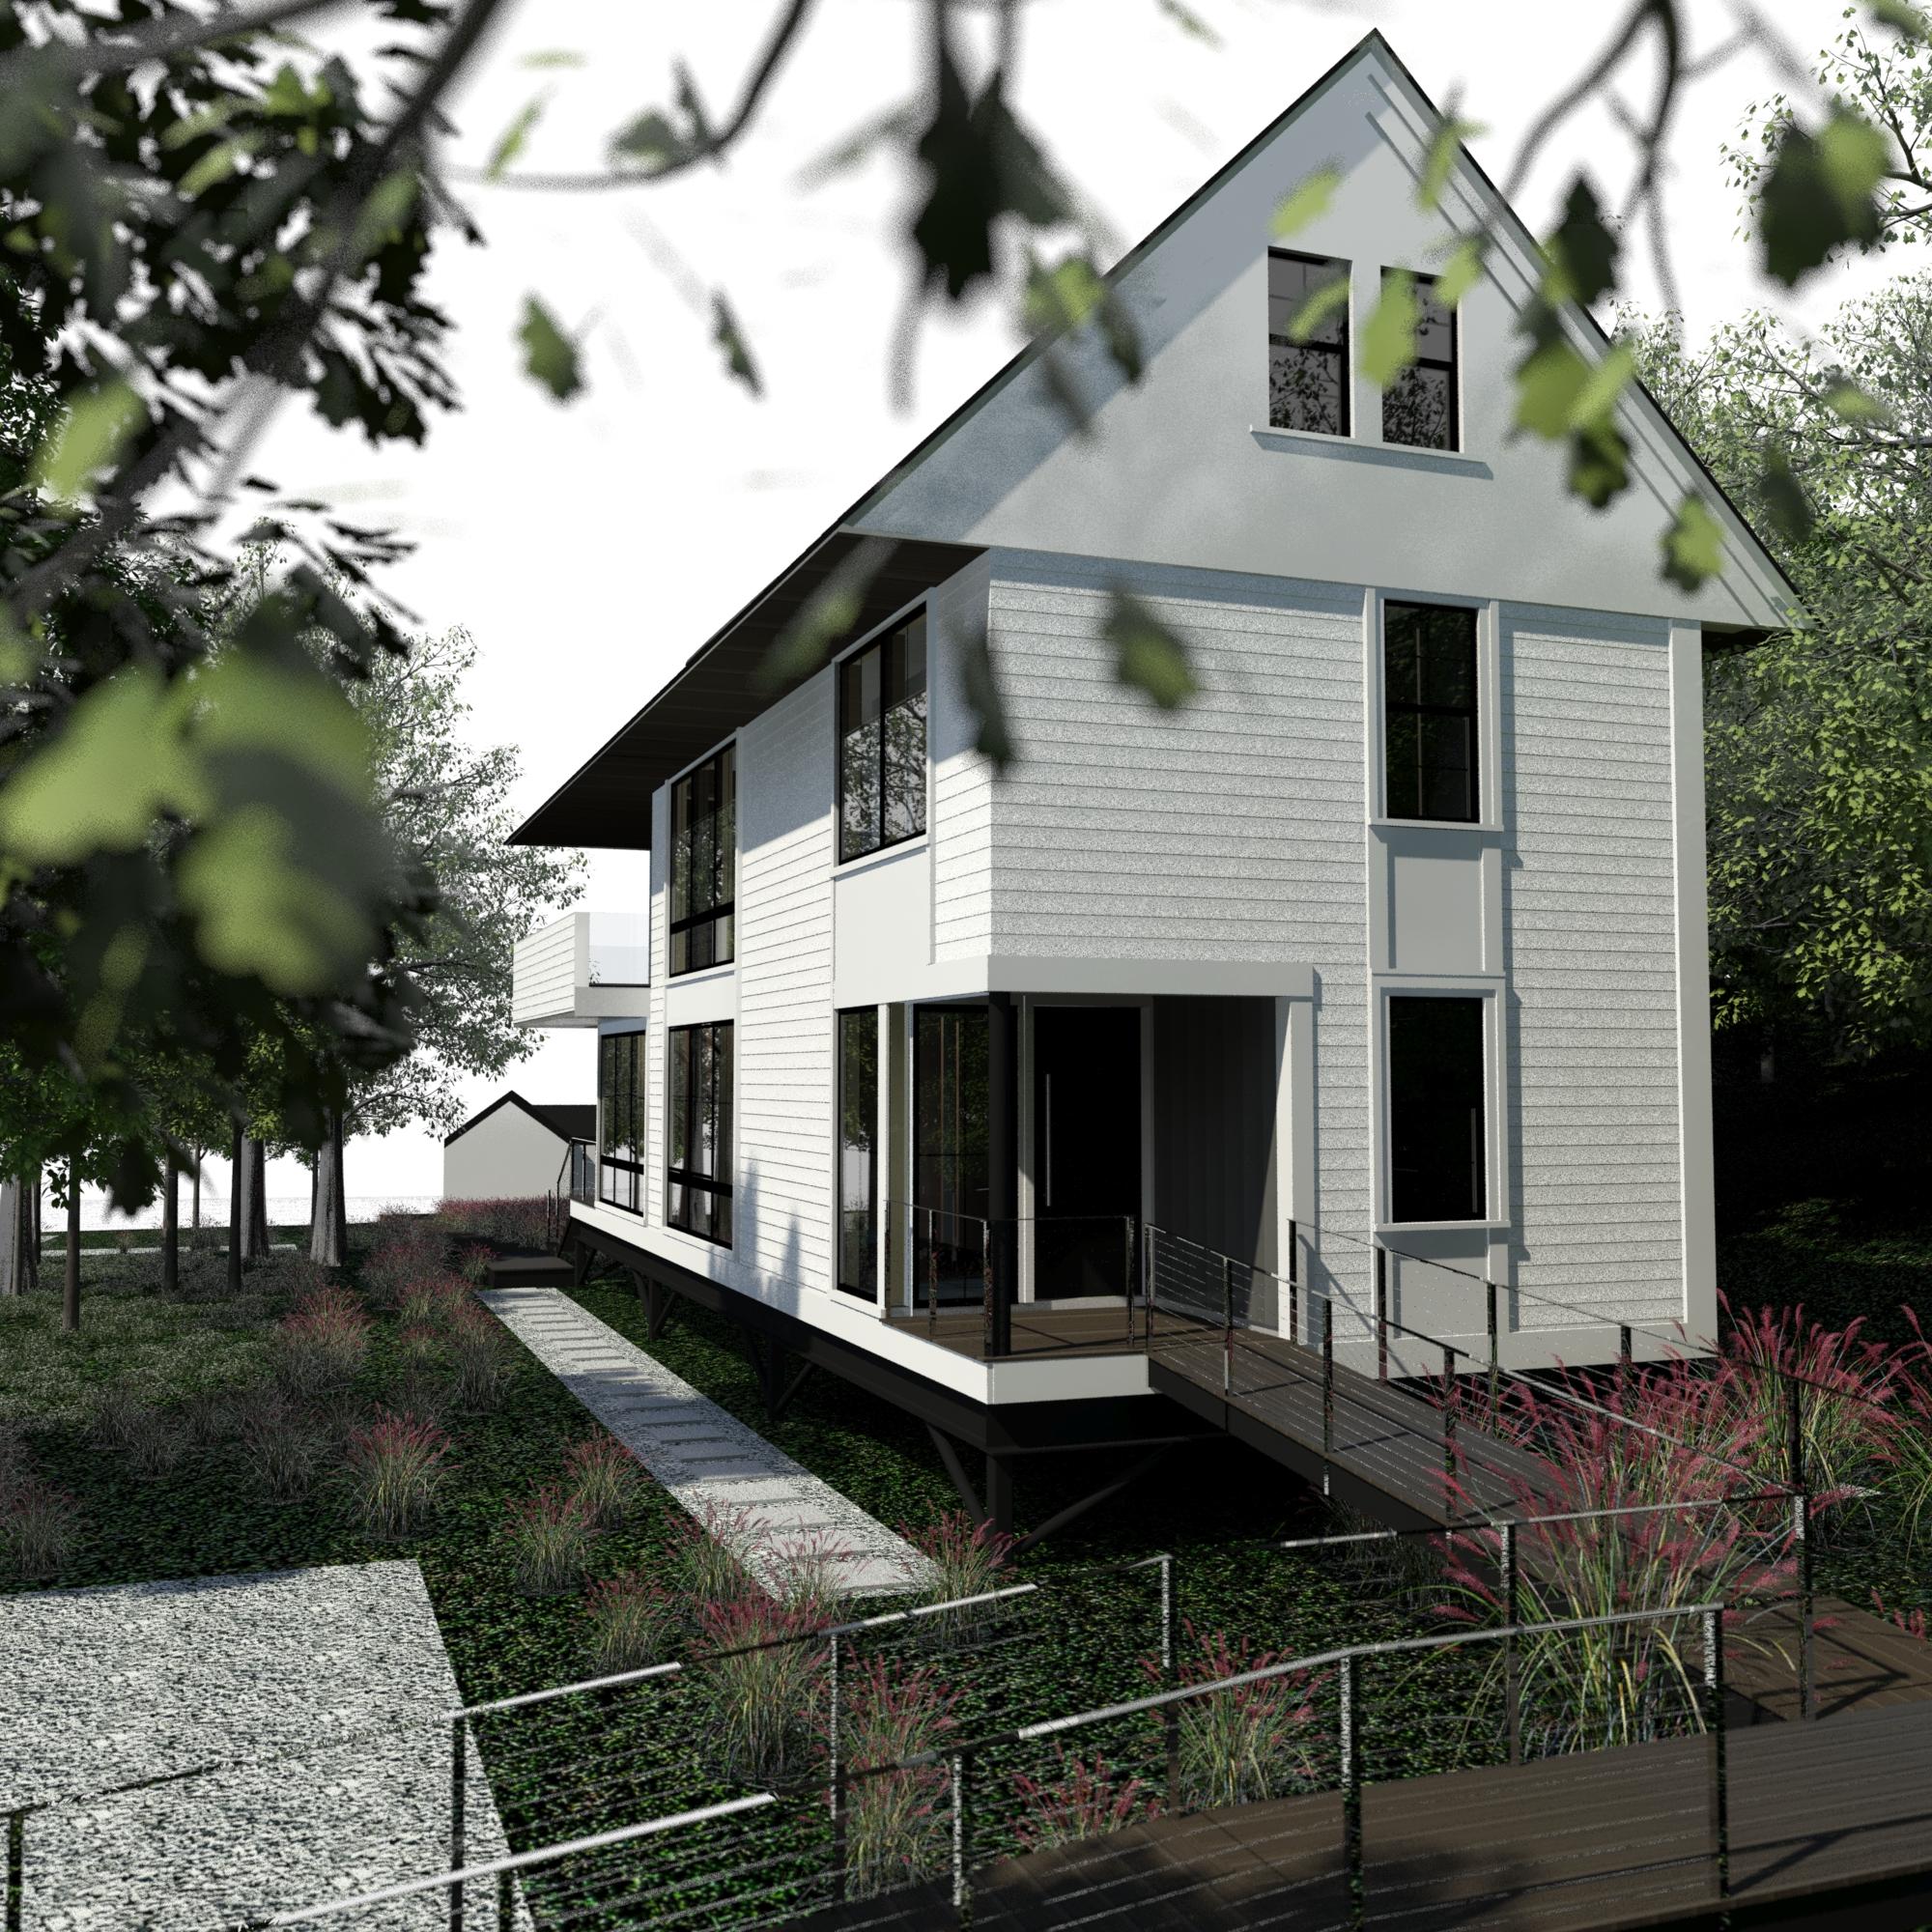 net-zero accessible home